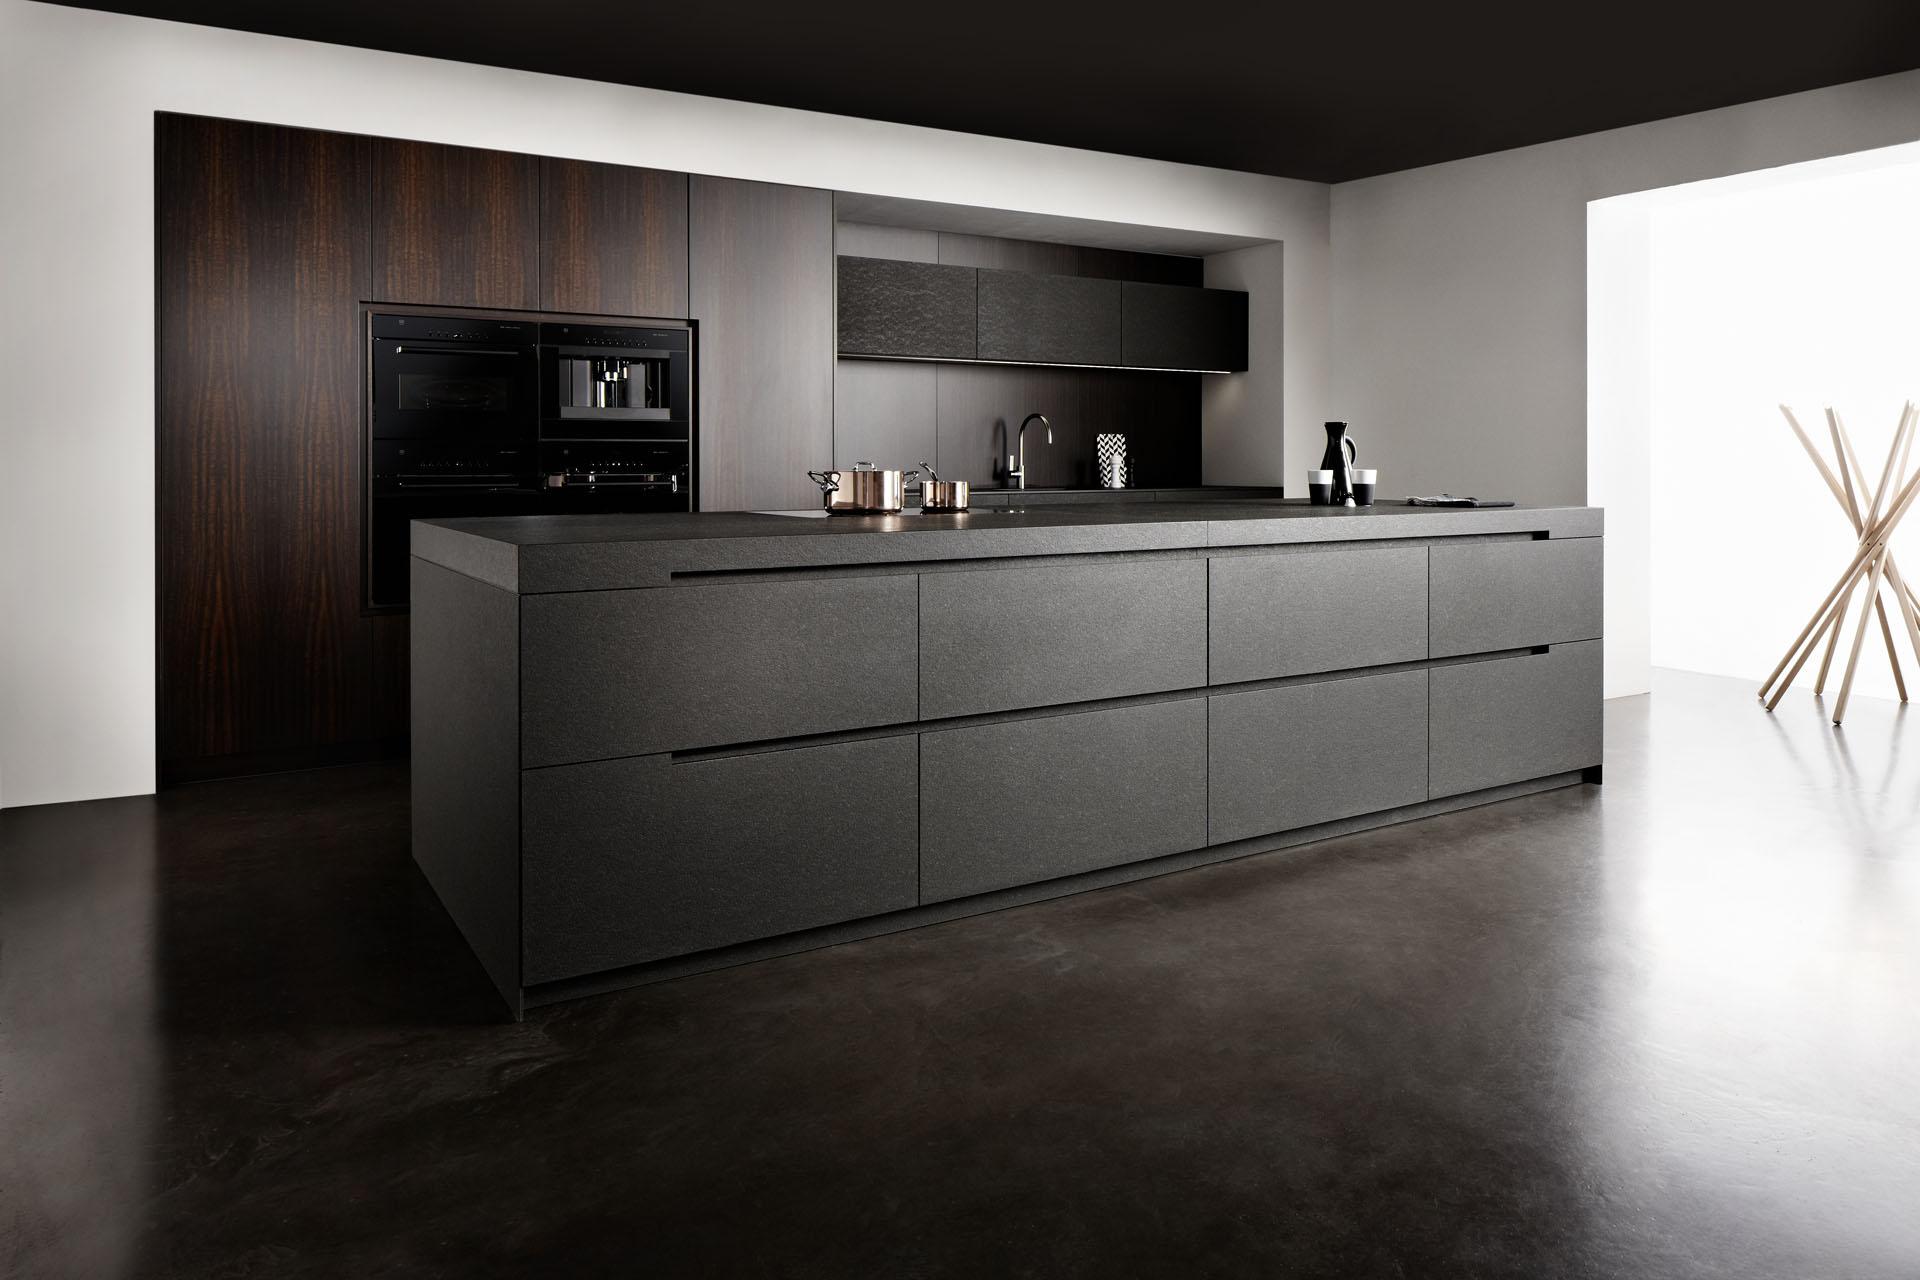 Greeploze keukens nieuwe keuken kopen? aswa keukens